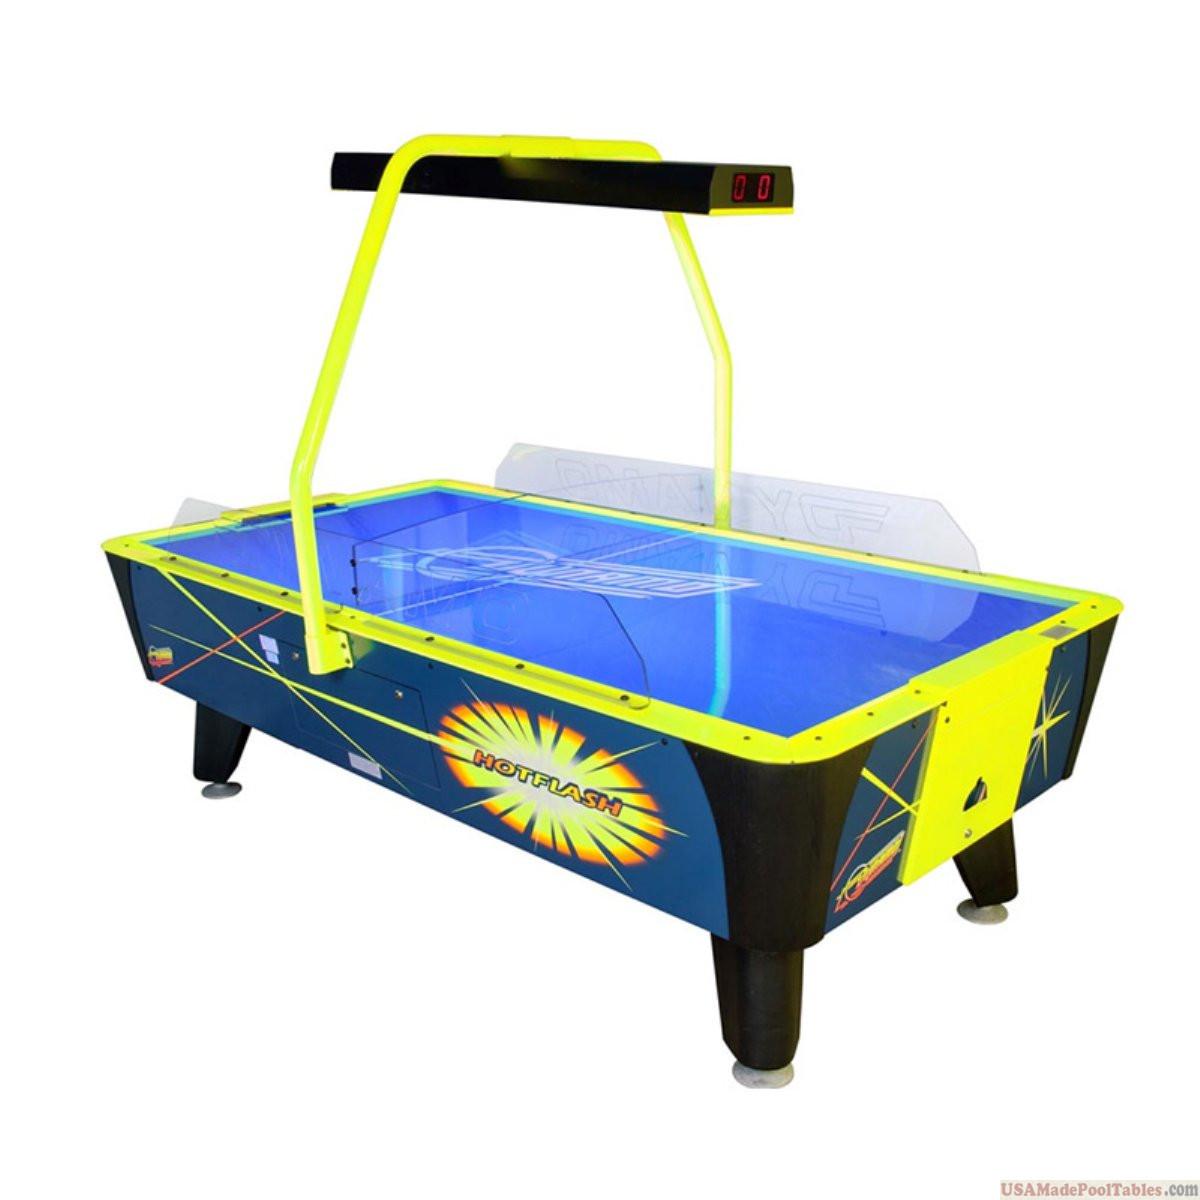 8 foot Flash  Air Hockey Table